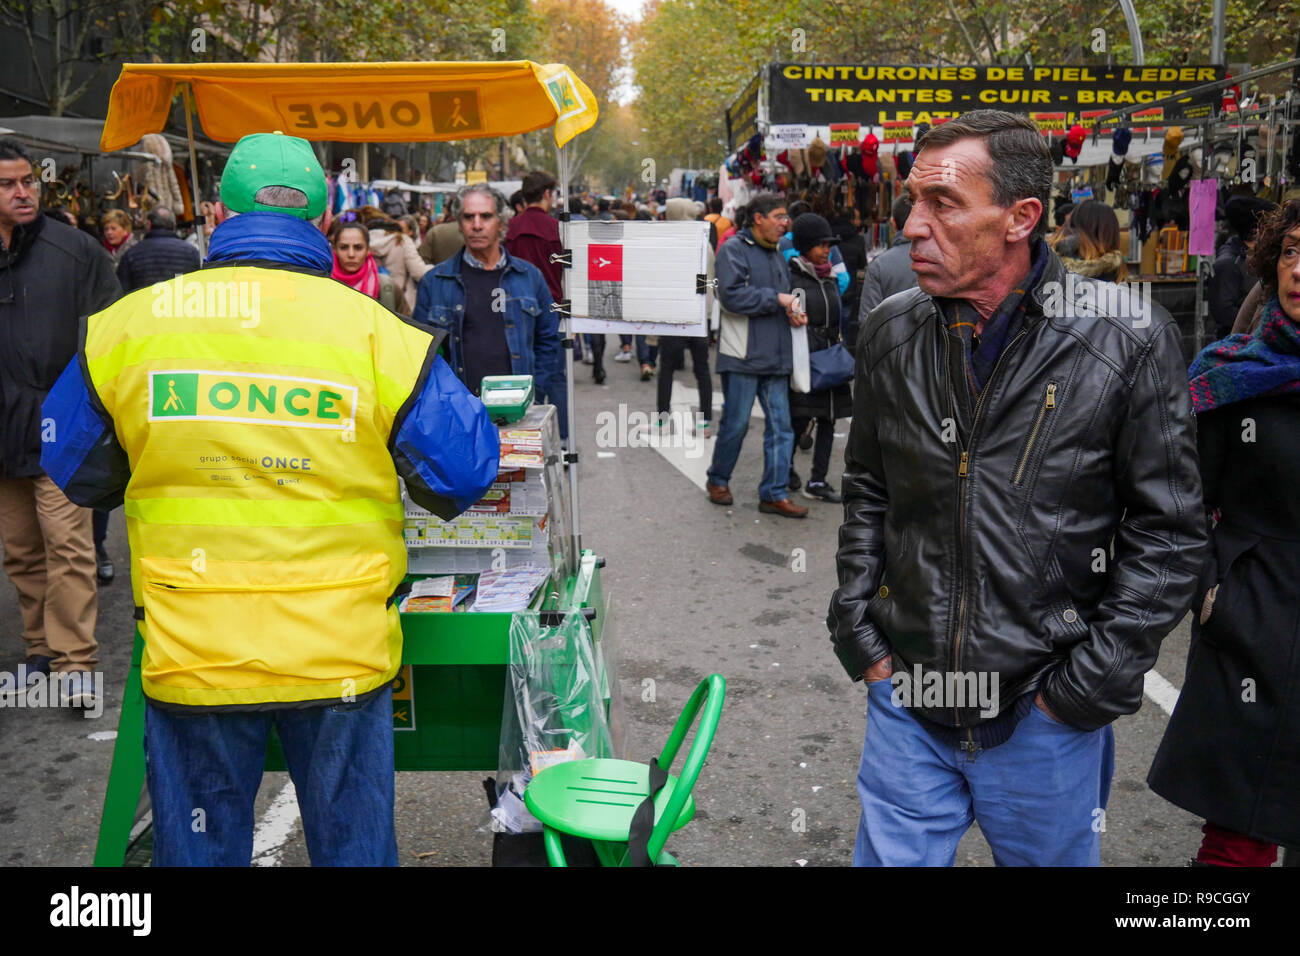 ONCE lottery tickets seller, El Rastro Flea Market, Madrid, Spain - Stock Image